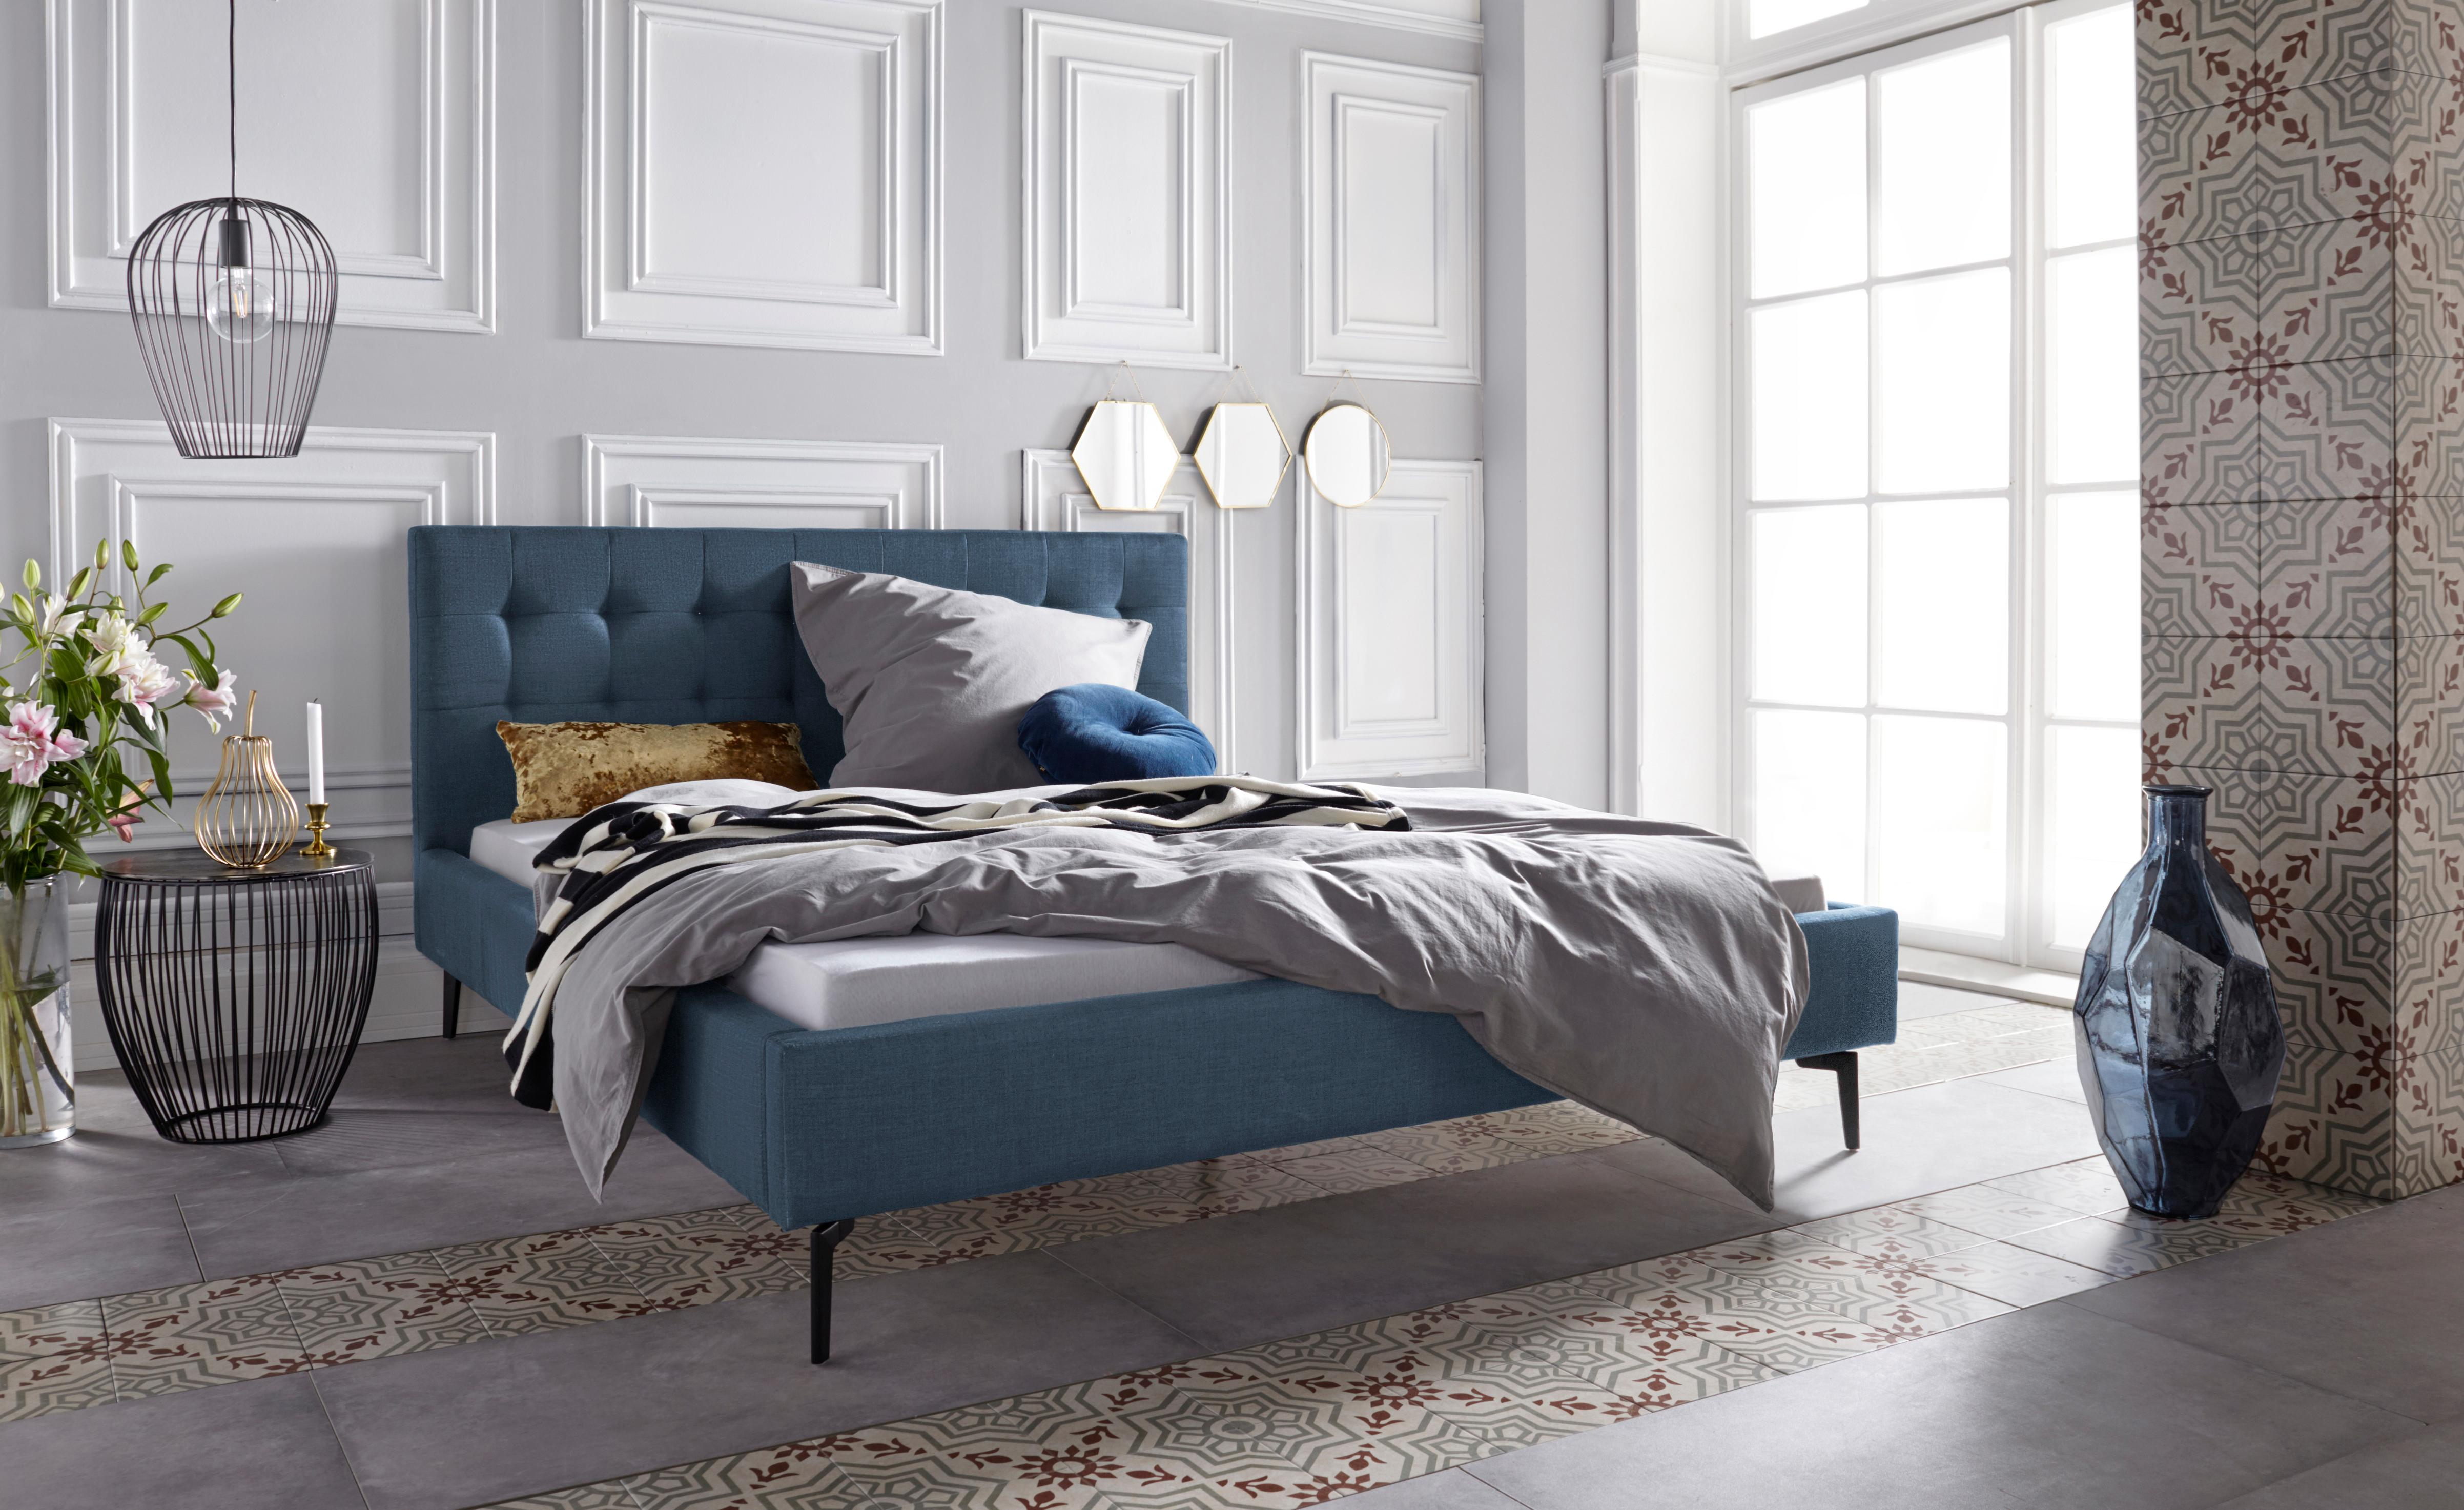 Leonique Polsterbett »Sinaloa« | Schlafzimmer > Betten > Polsterbetten | Leonique